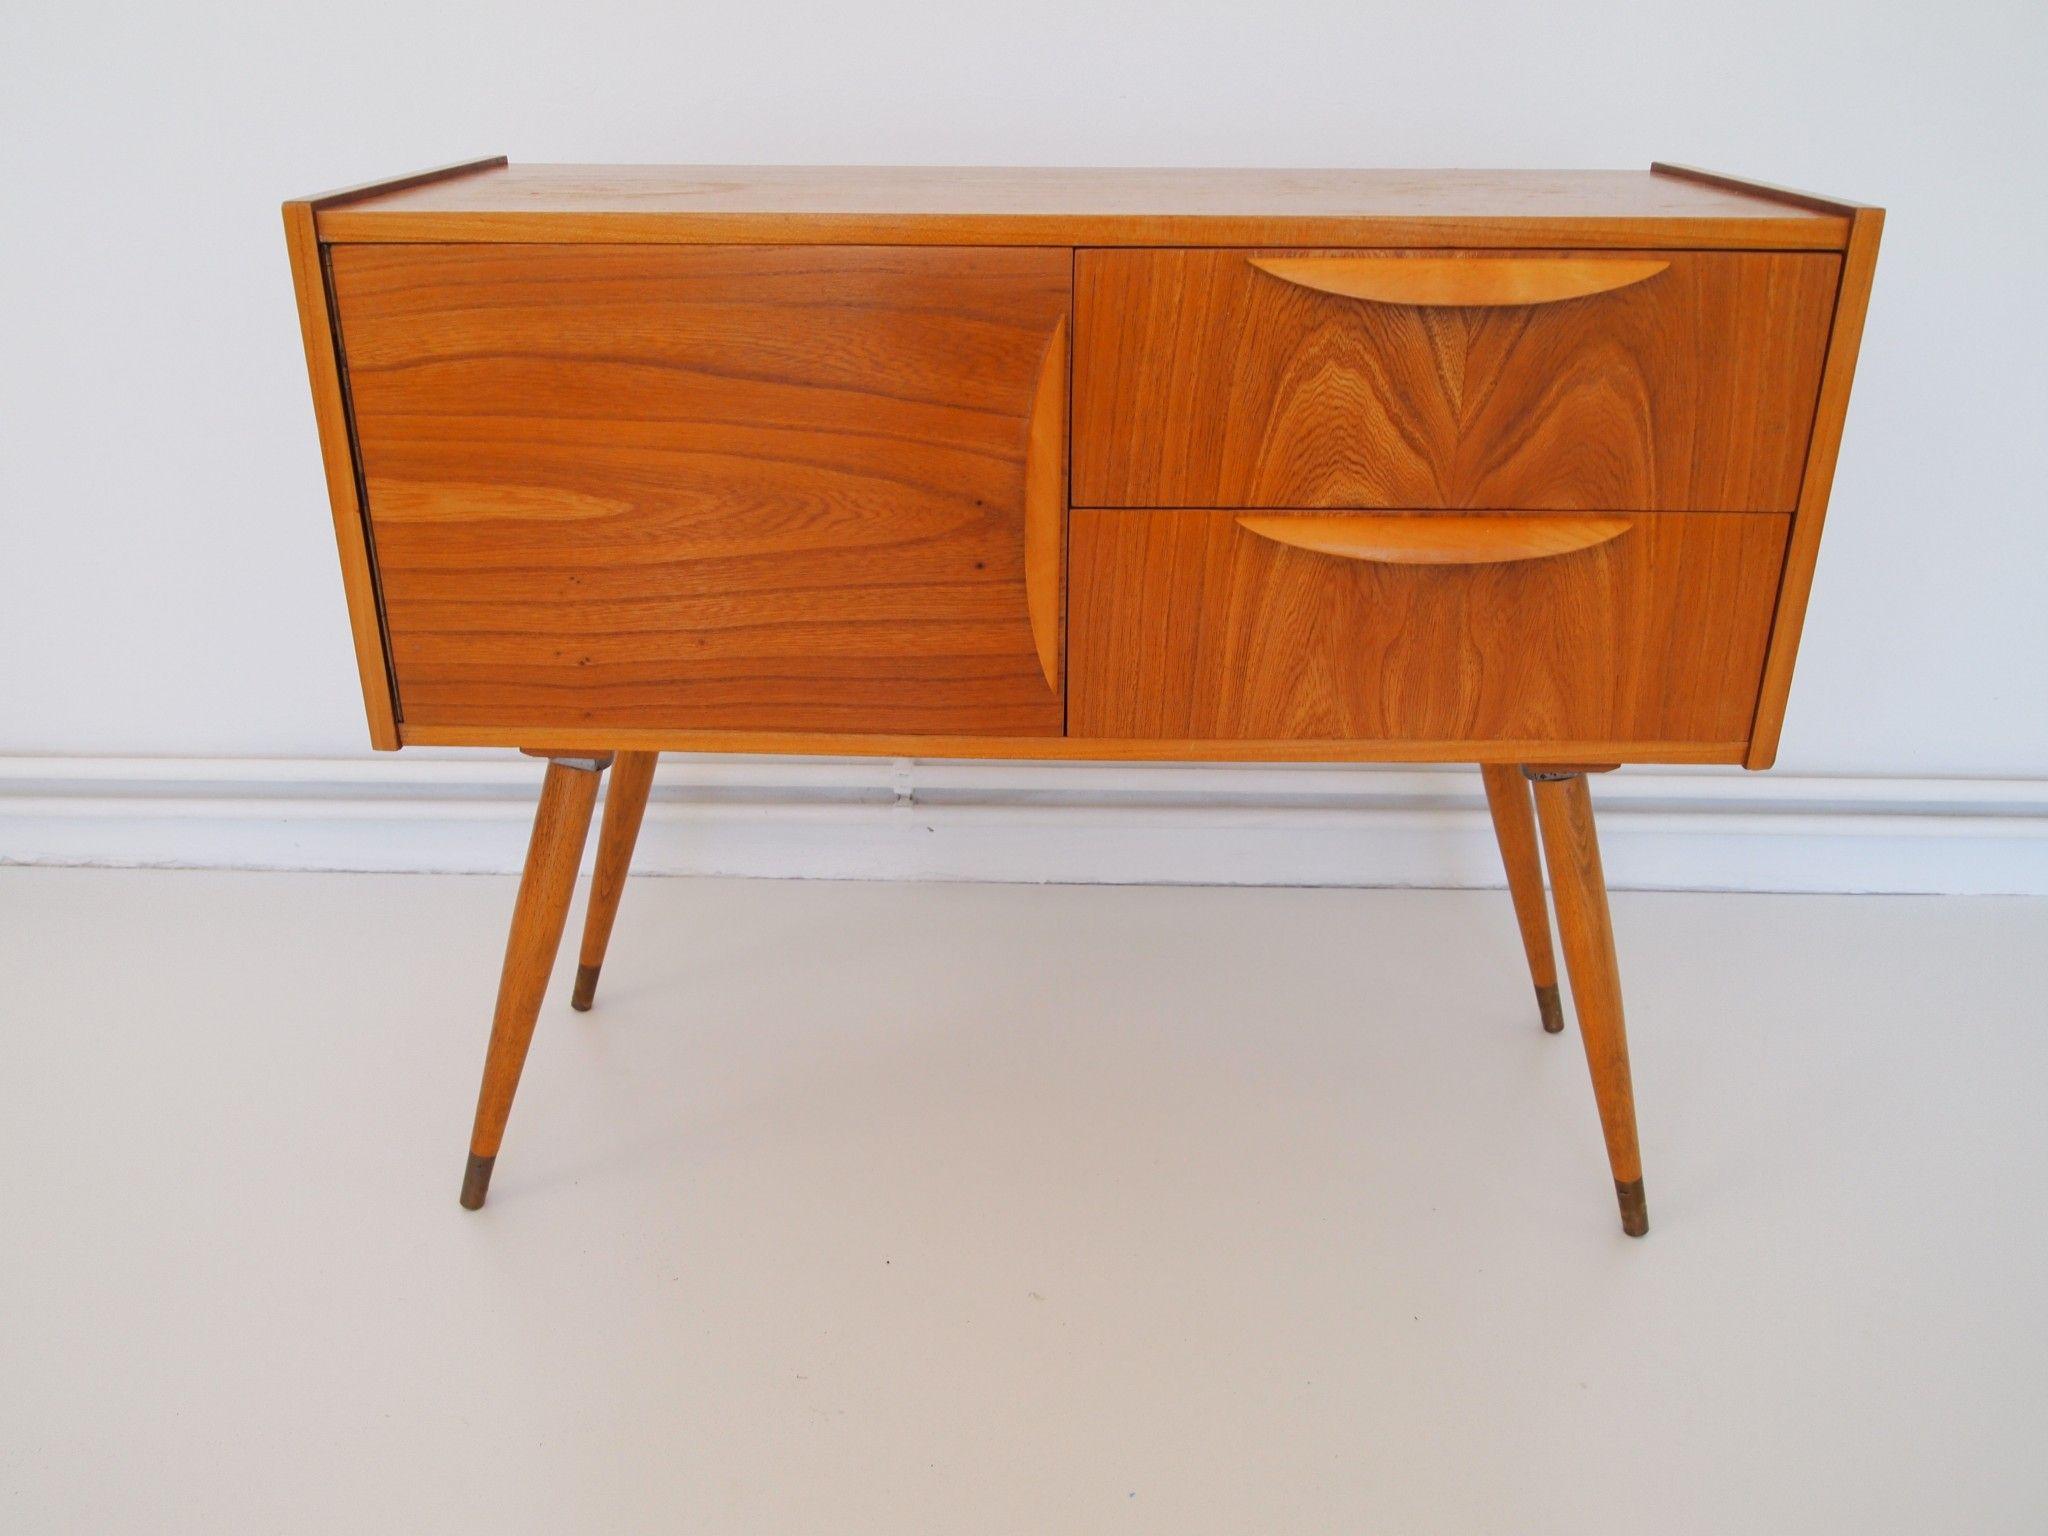 Szafka Patyczak Lata 70 Home Decor Decor Furniture